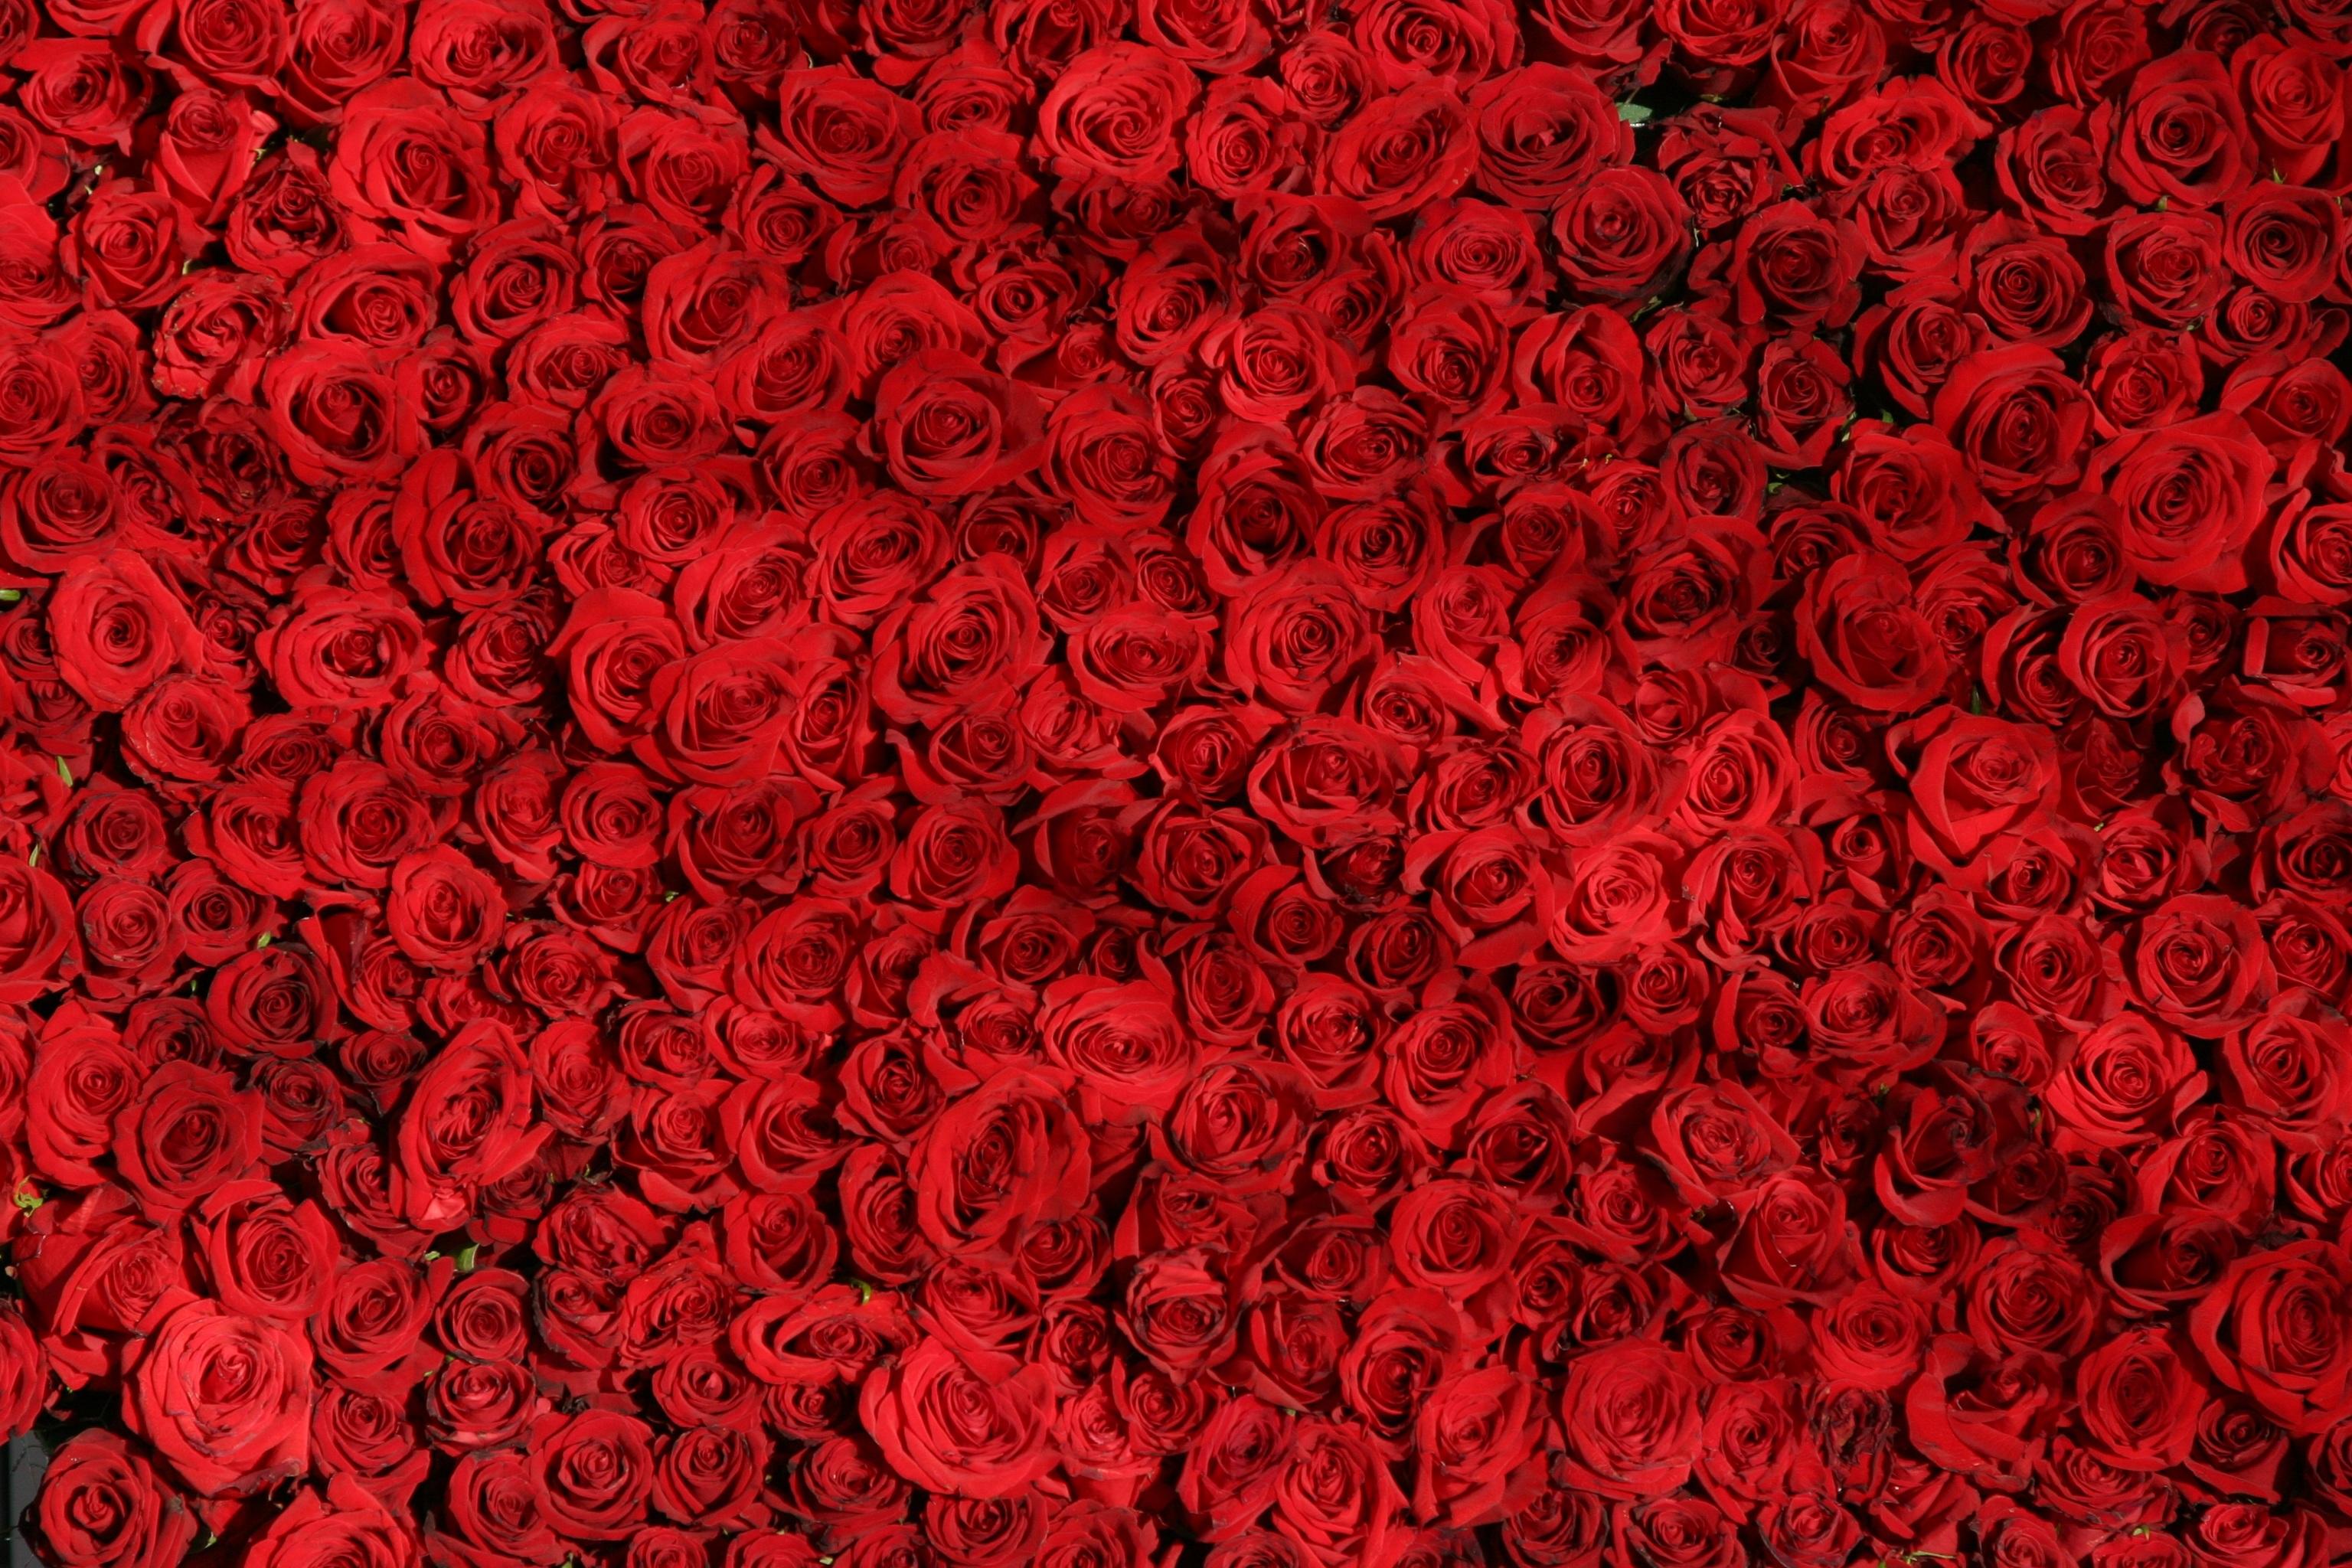 free images : texture, flower, petal, heart, rose, pattern, line